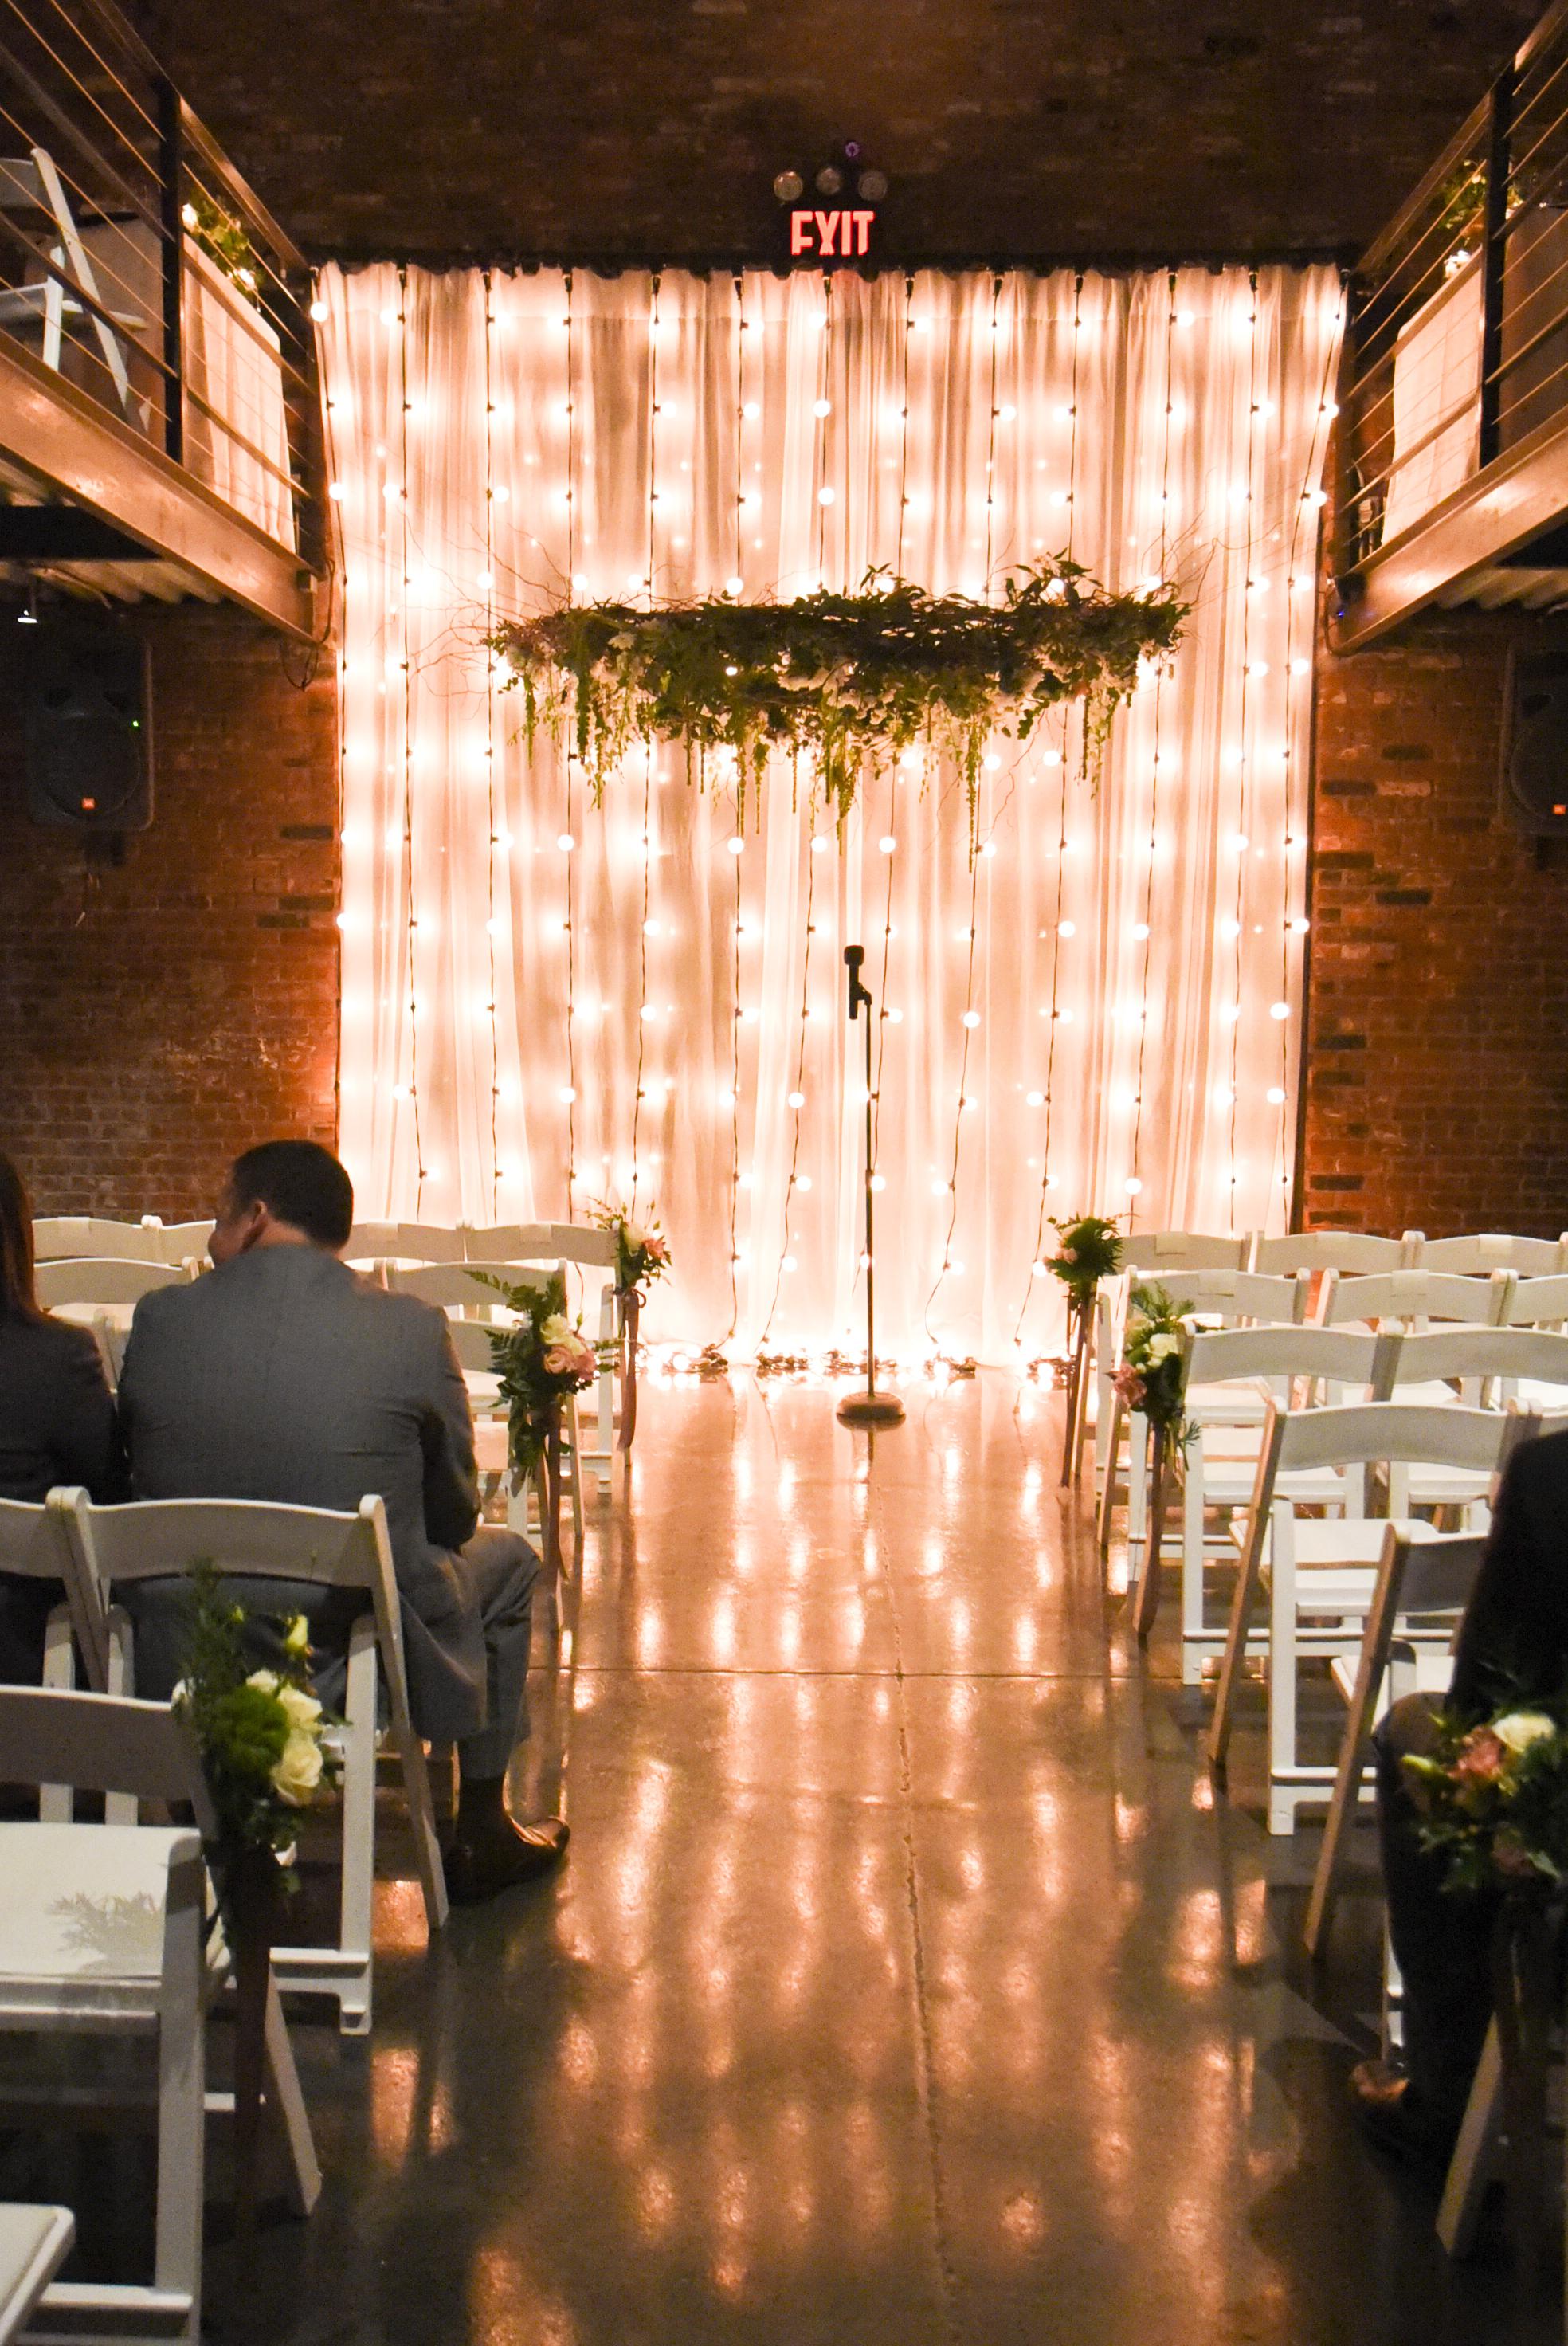 A flower chandelier creates magic